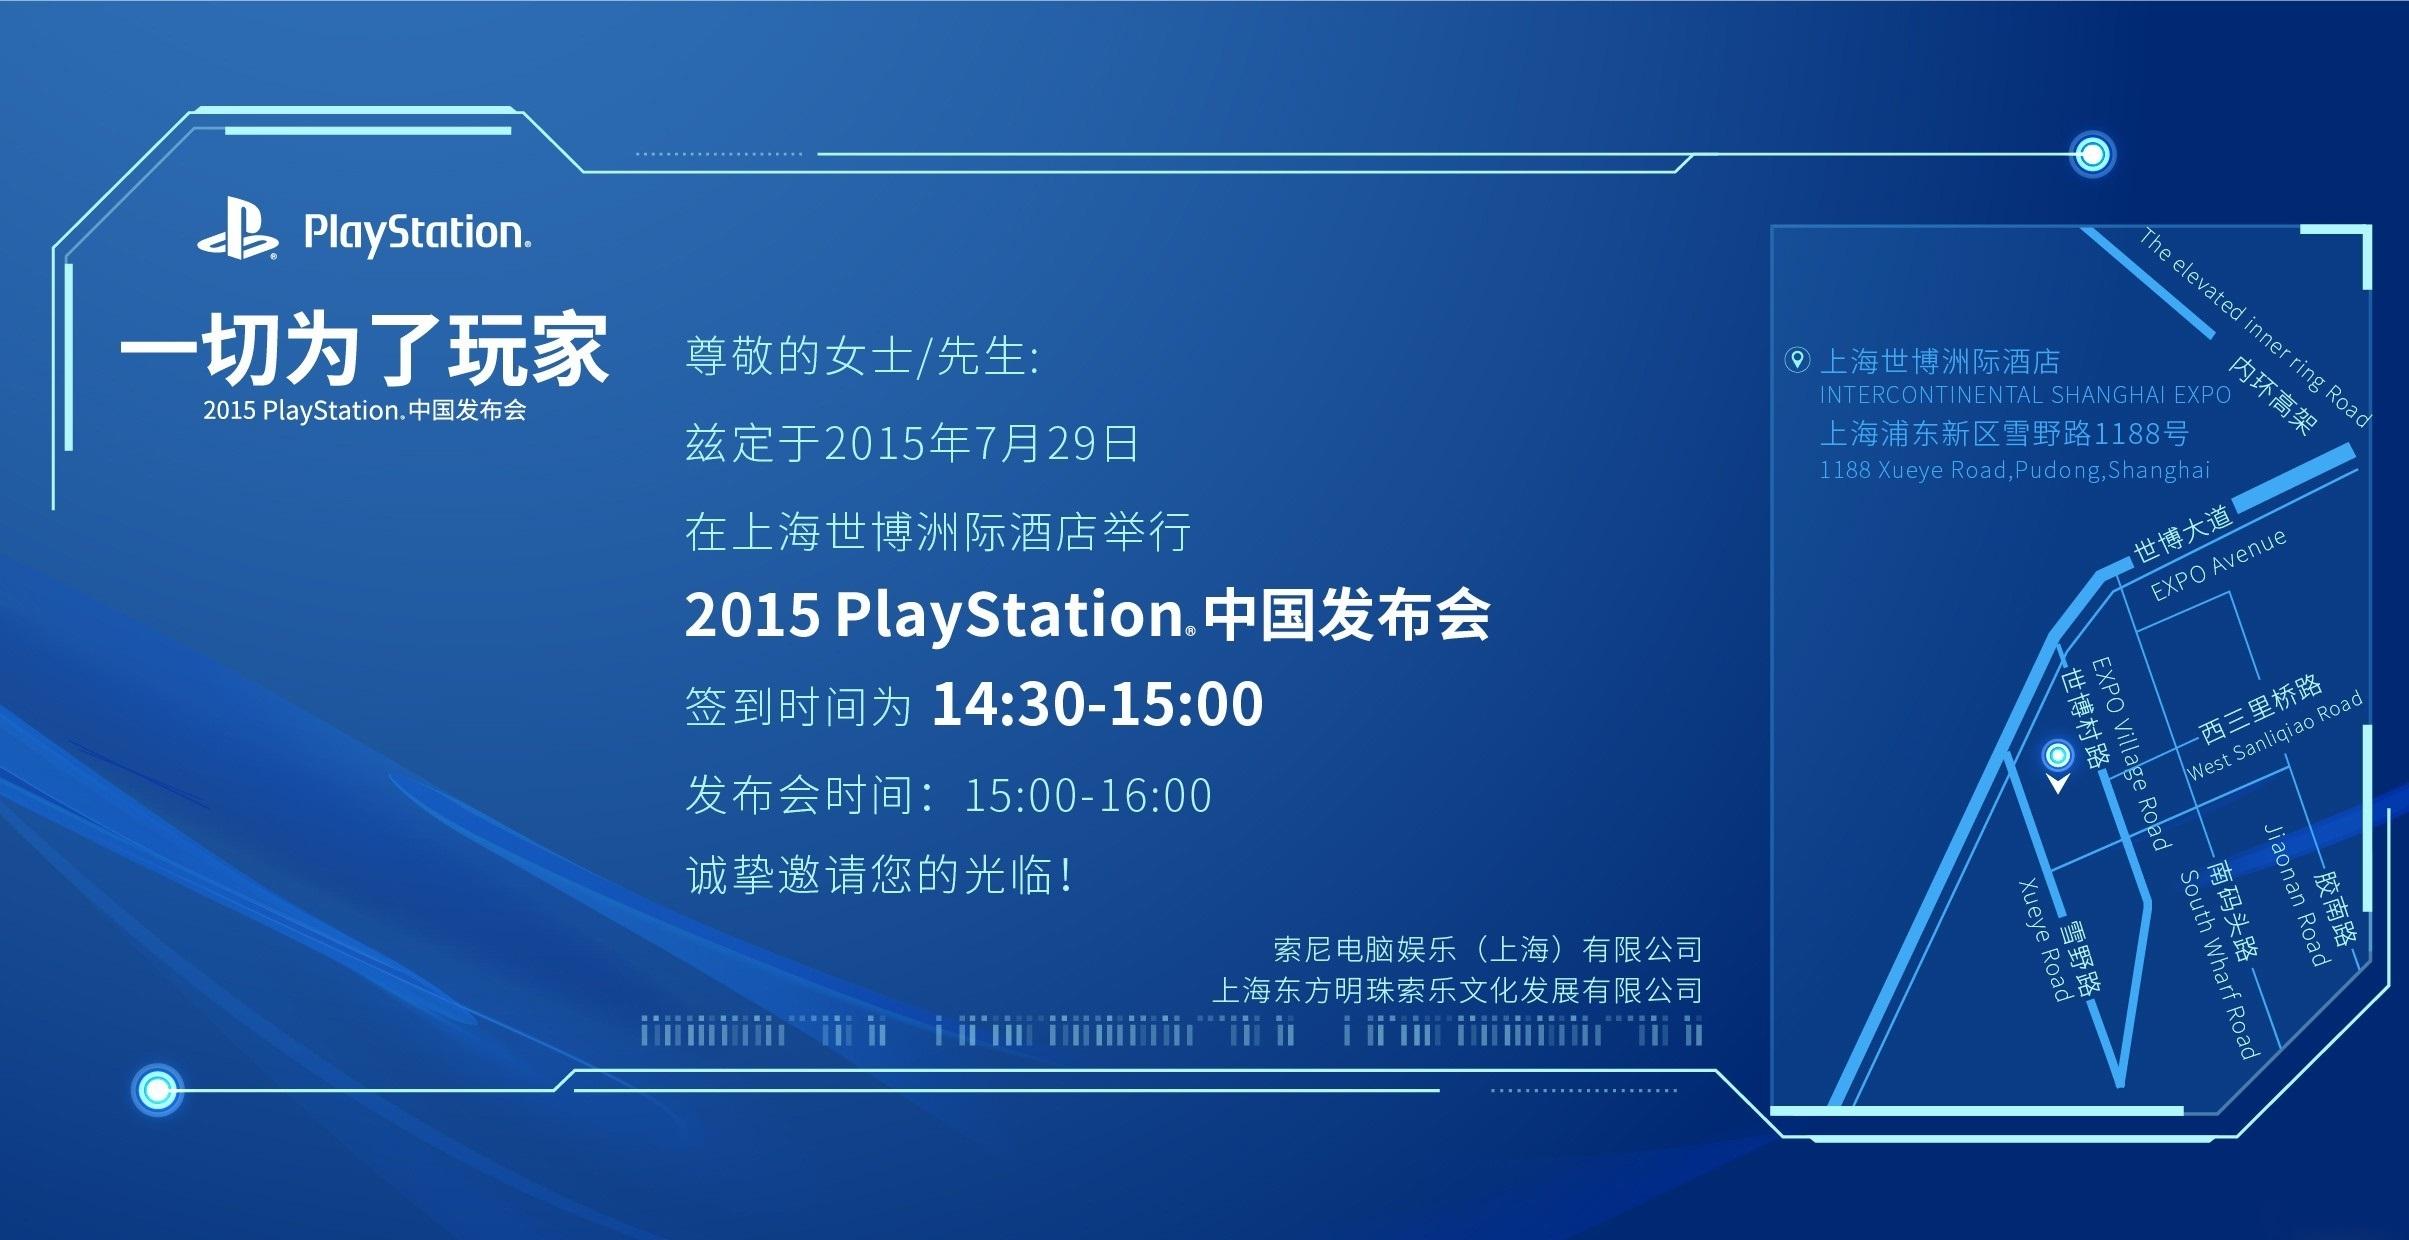 PlayStation中国2016发布会时间确定